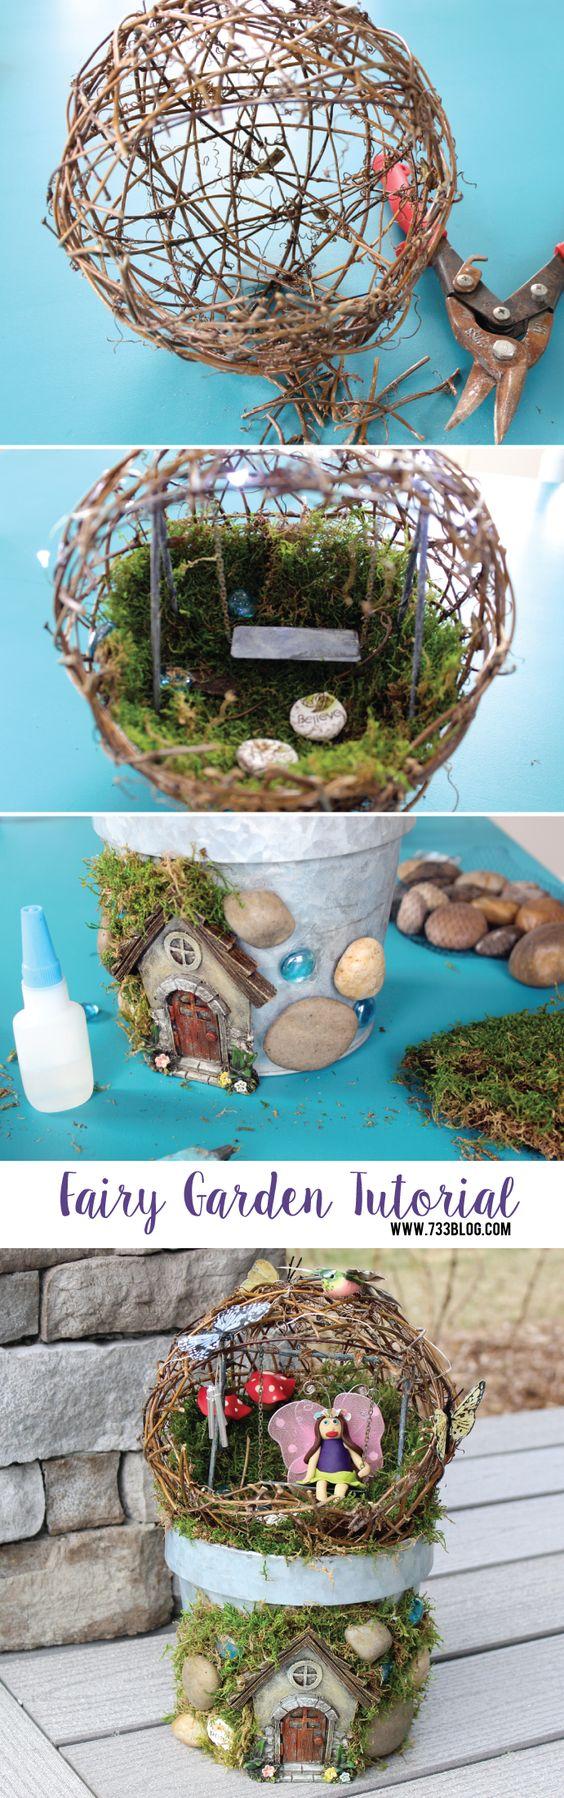 Marvellous Diy Fairy Garden Sphere On Miniature Fairy Garden Diy Fairy Garden Ideas Hative Diy Fairy Garden Supplies Diy Fairy Garden Mushrooms garden Diy Fairy Garden